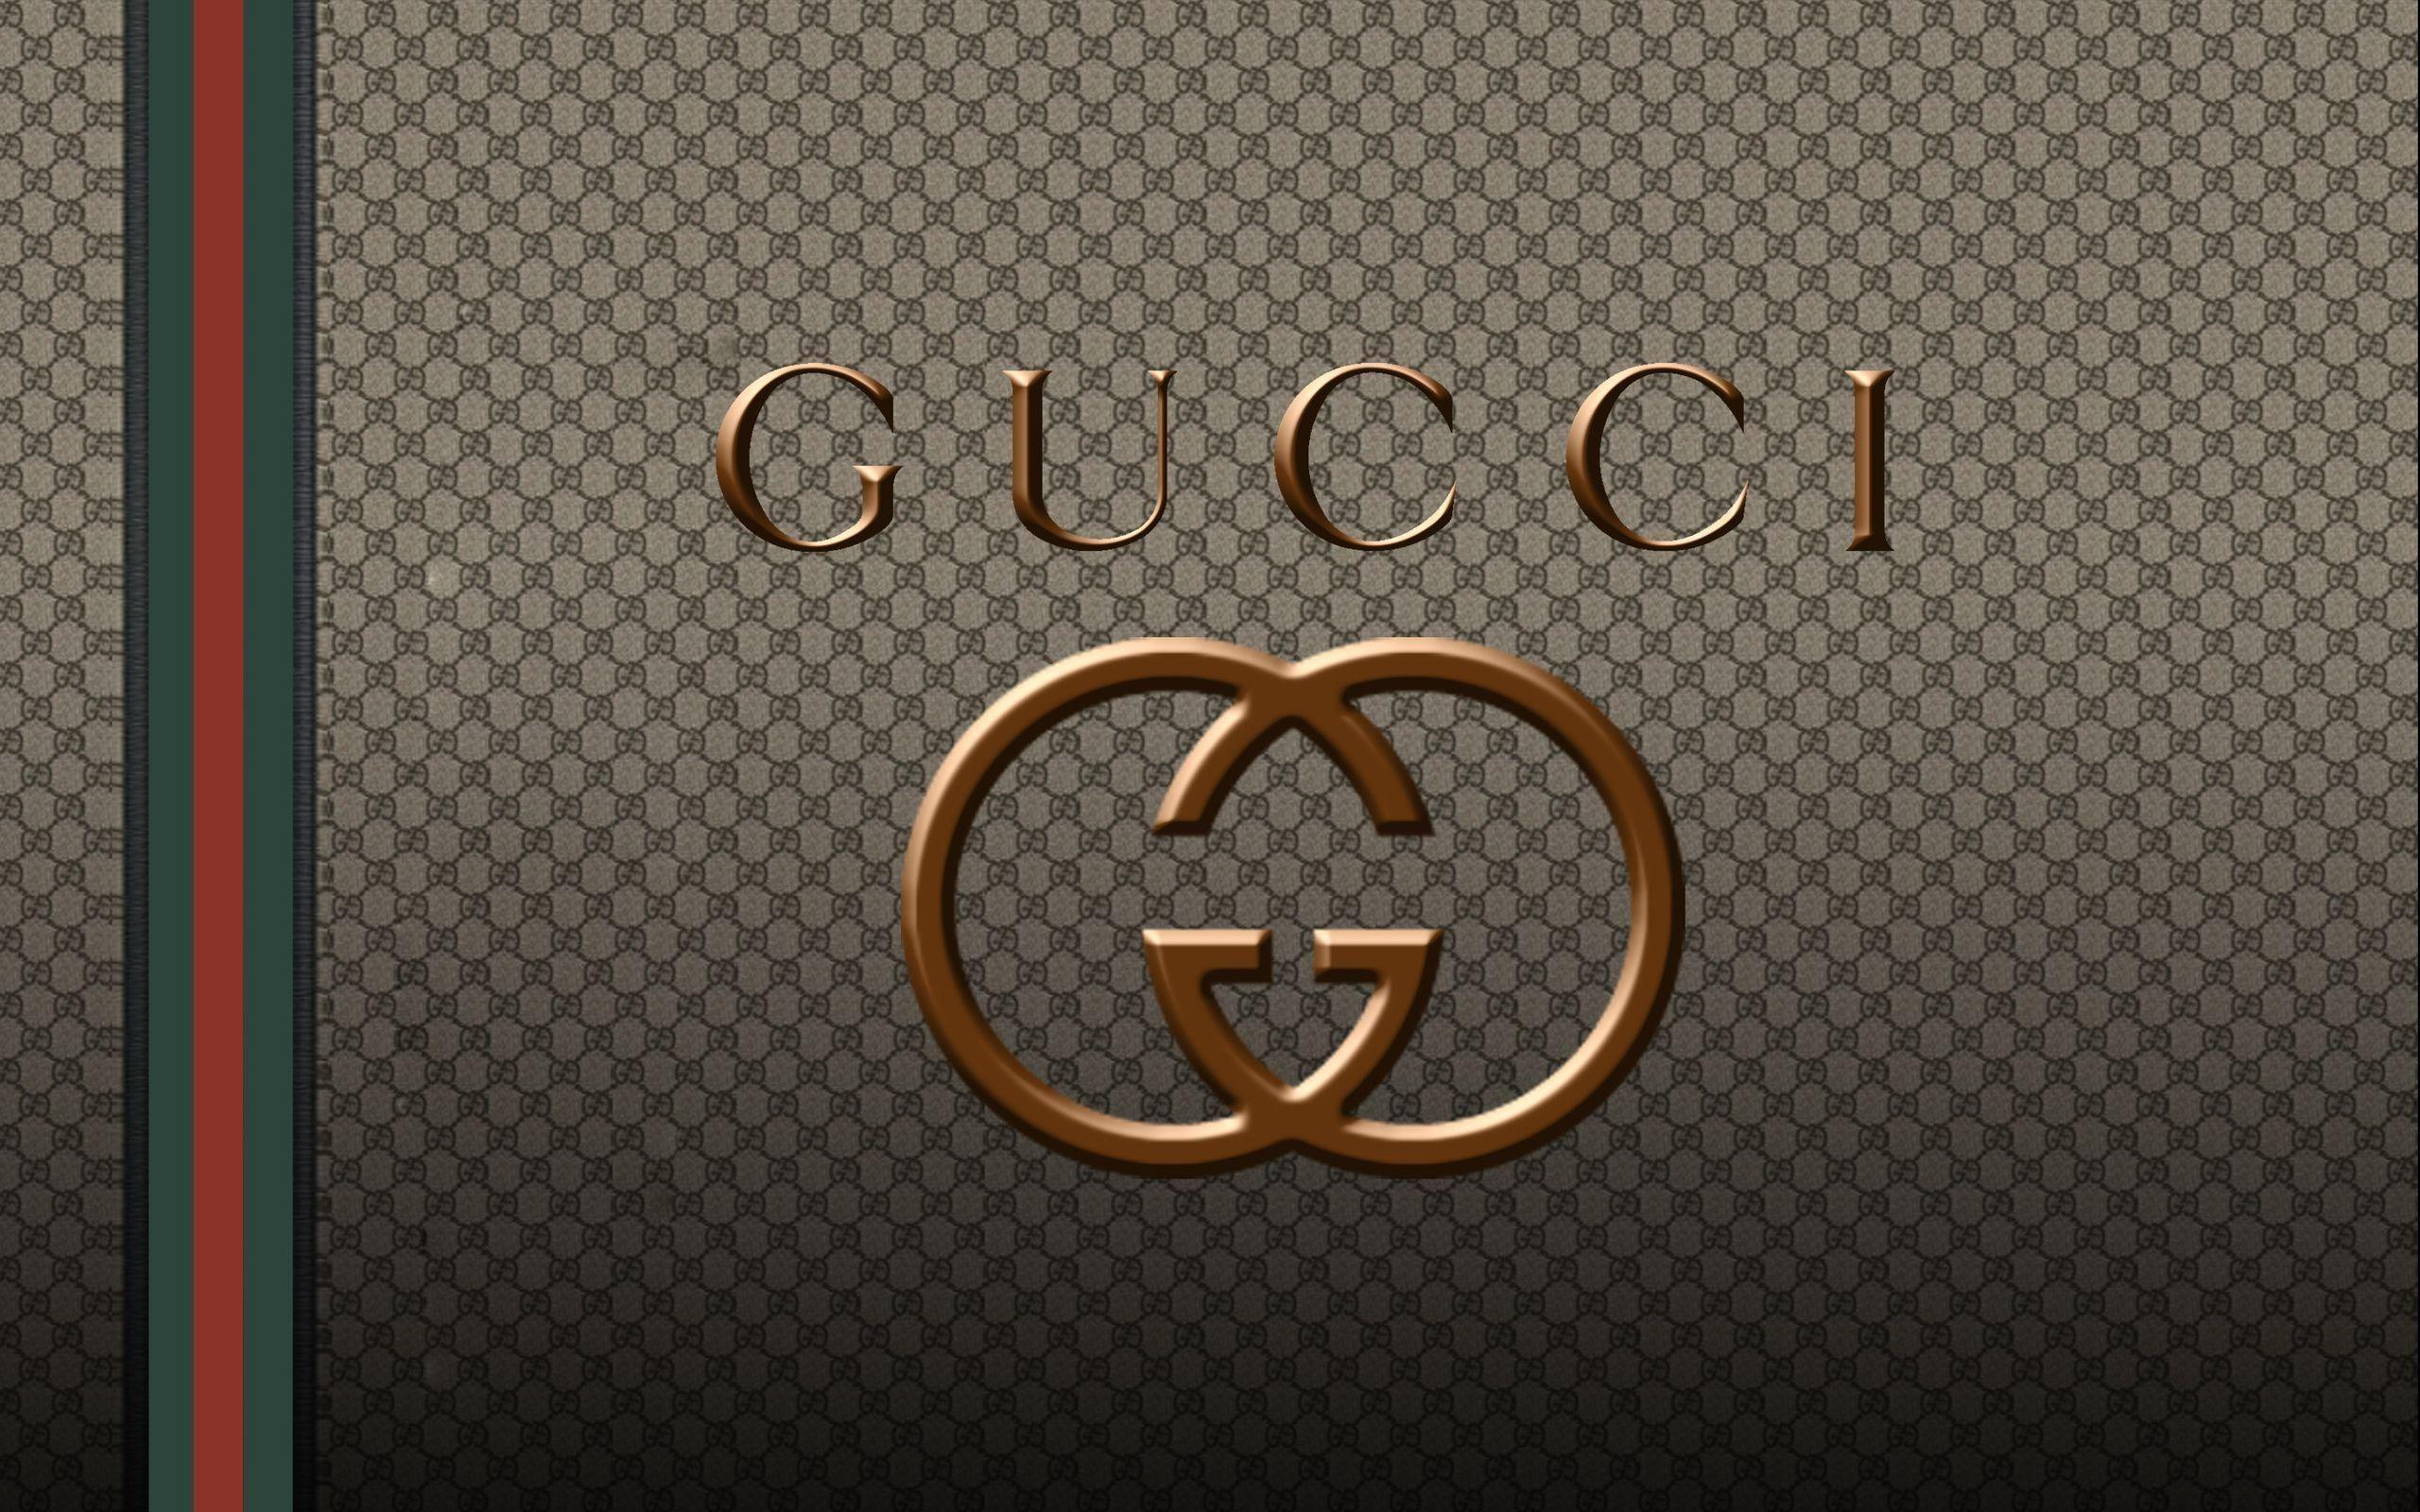 Gucci Wallpaper 05 - [2560x1600]